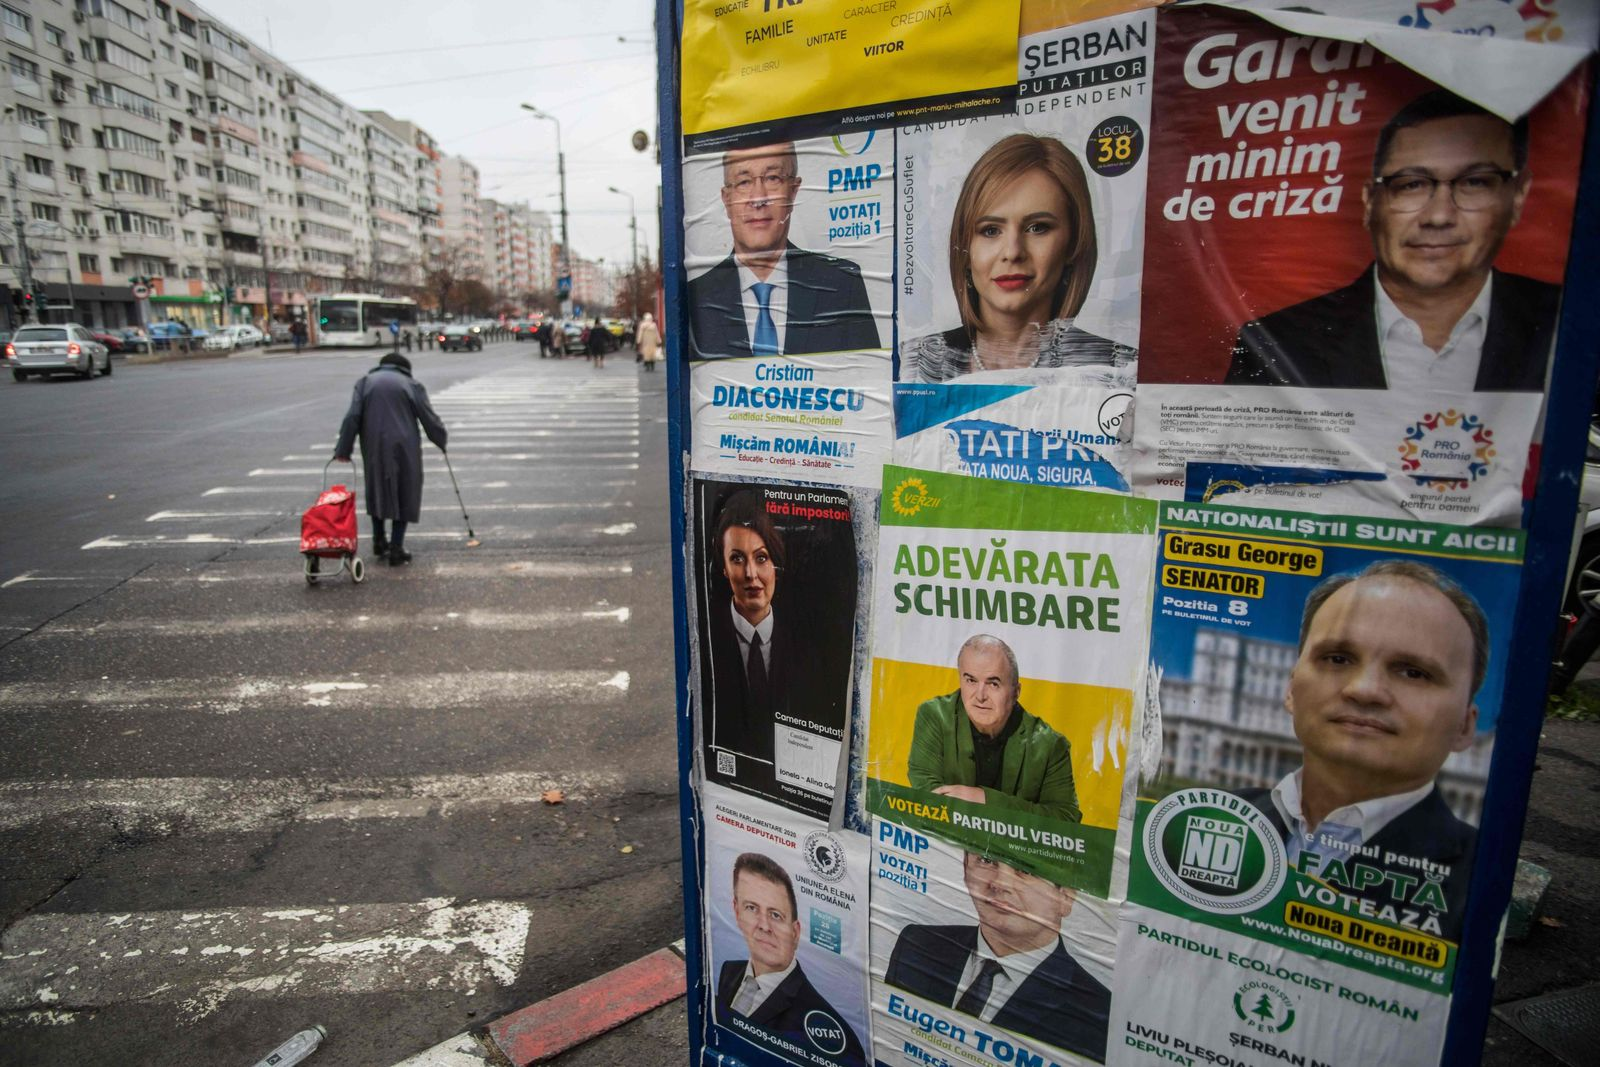 ROMANIA-POLITICS-ELECTIONS-VOTE-ELECTION-VIRUS-PANDEMIC-HEALTH